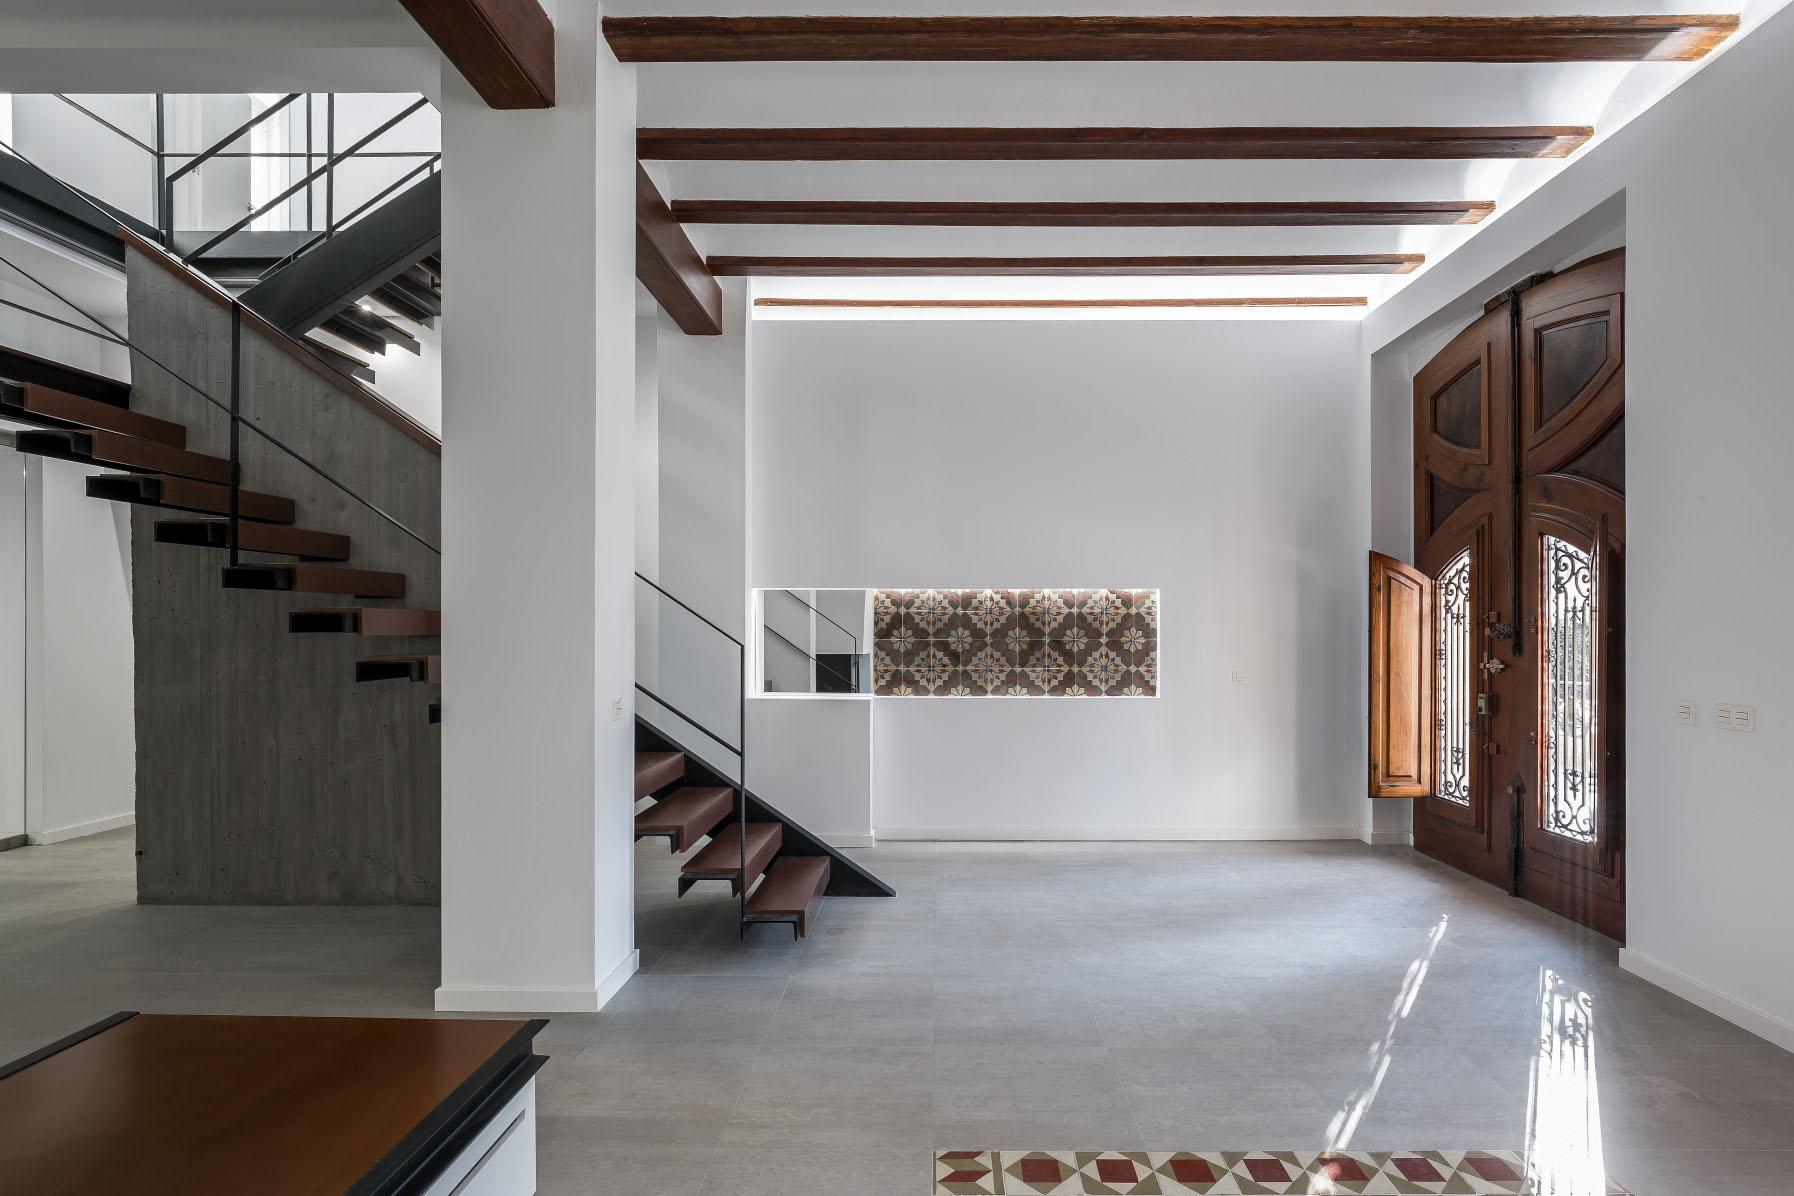 fotografia-arquitectura-valencia-german-cabo-viraje-rehabilitacion-campanar (x)_portada